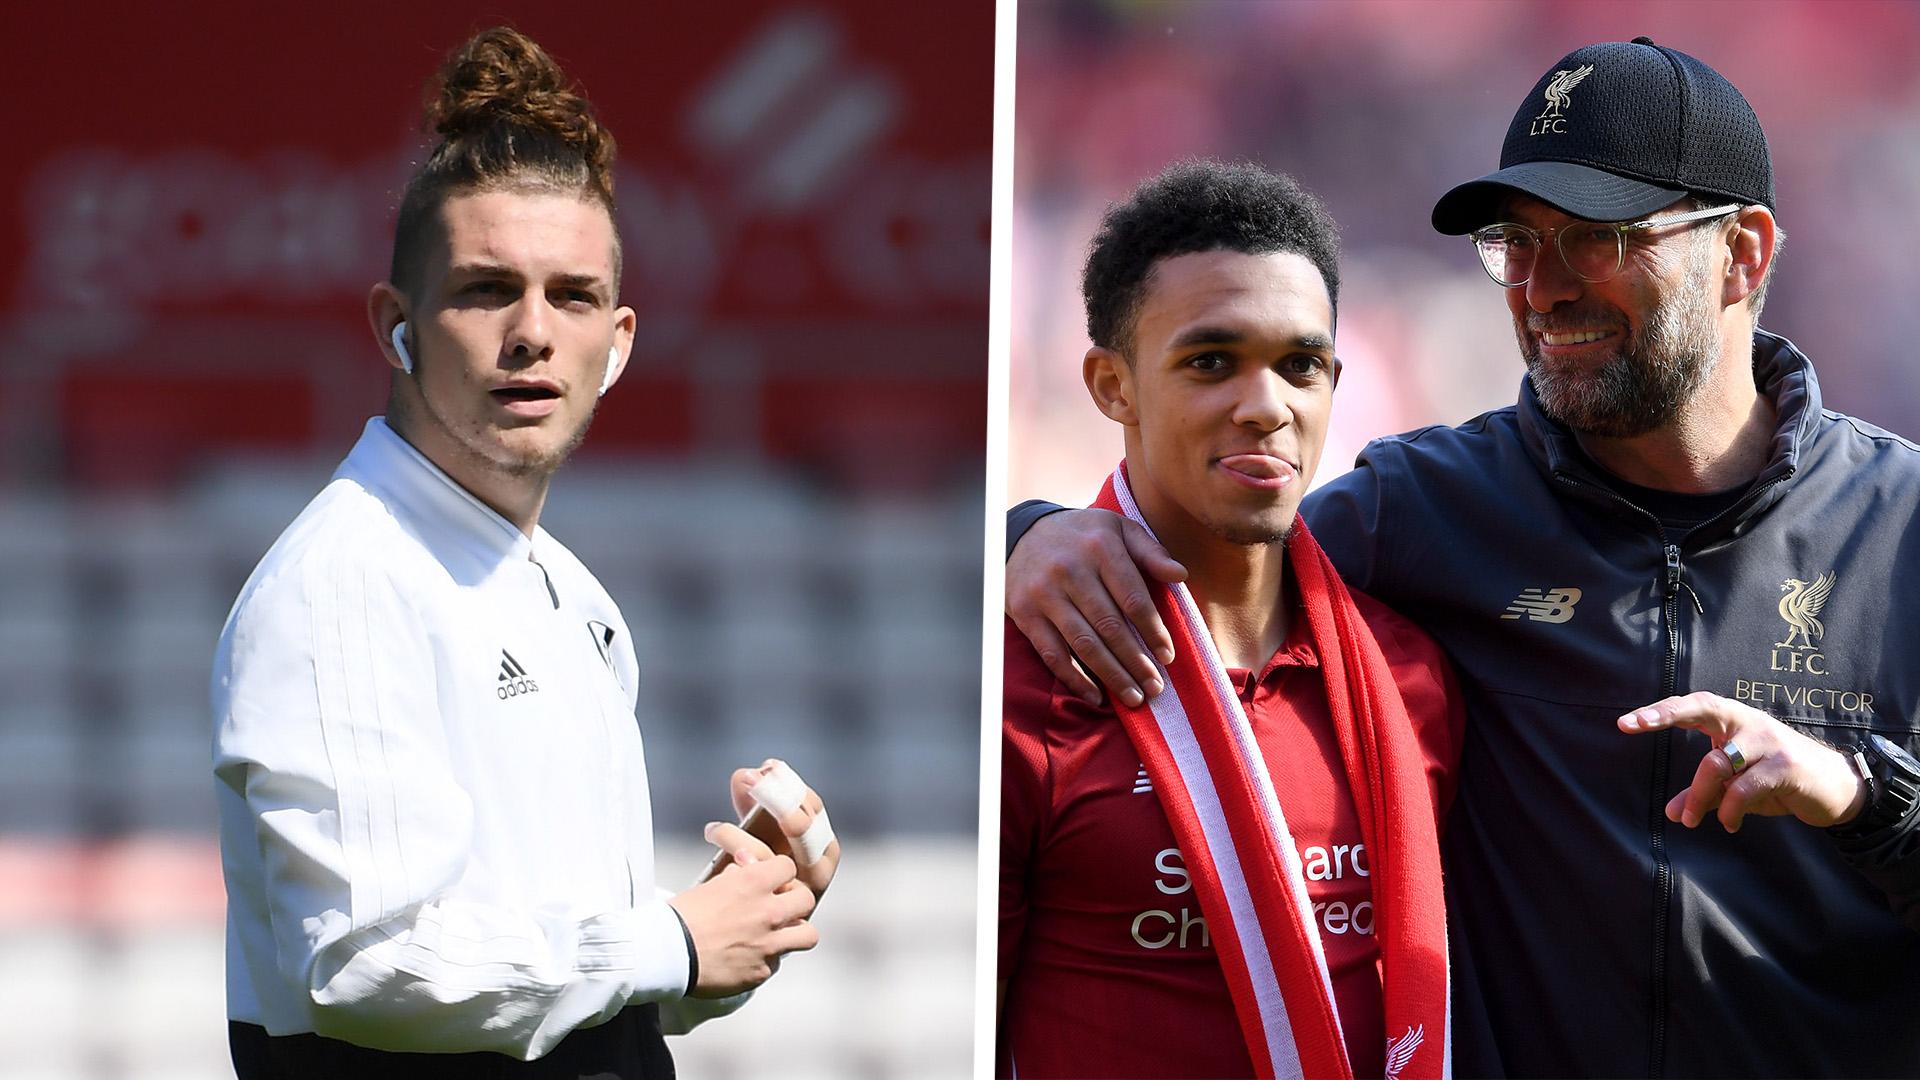 Liverpool unable to spend 'crazy money' this summer, says Jurgen Klopp